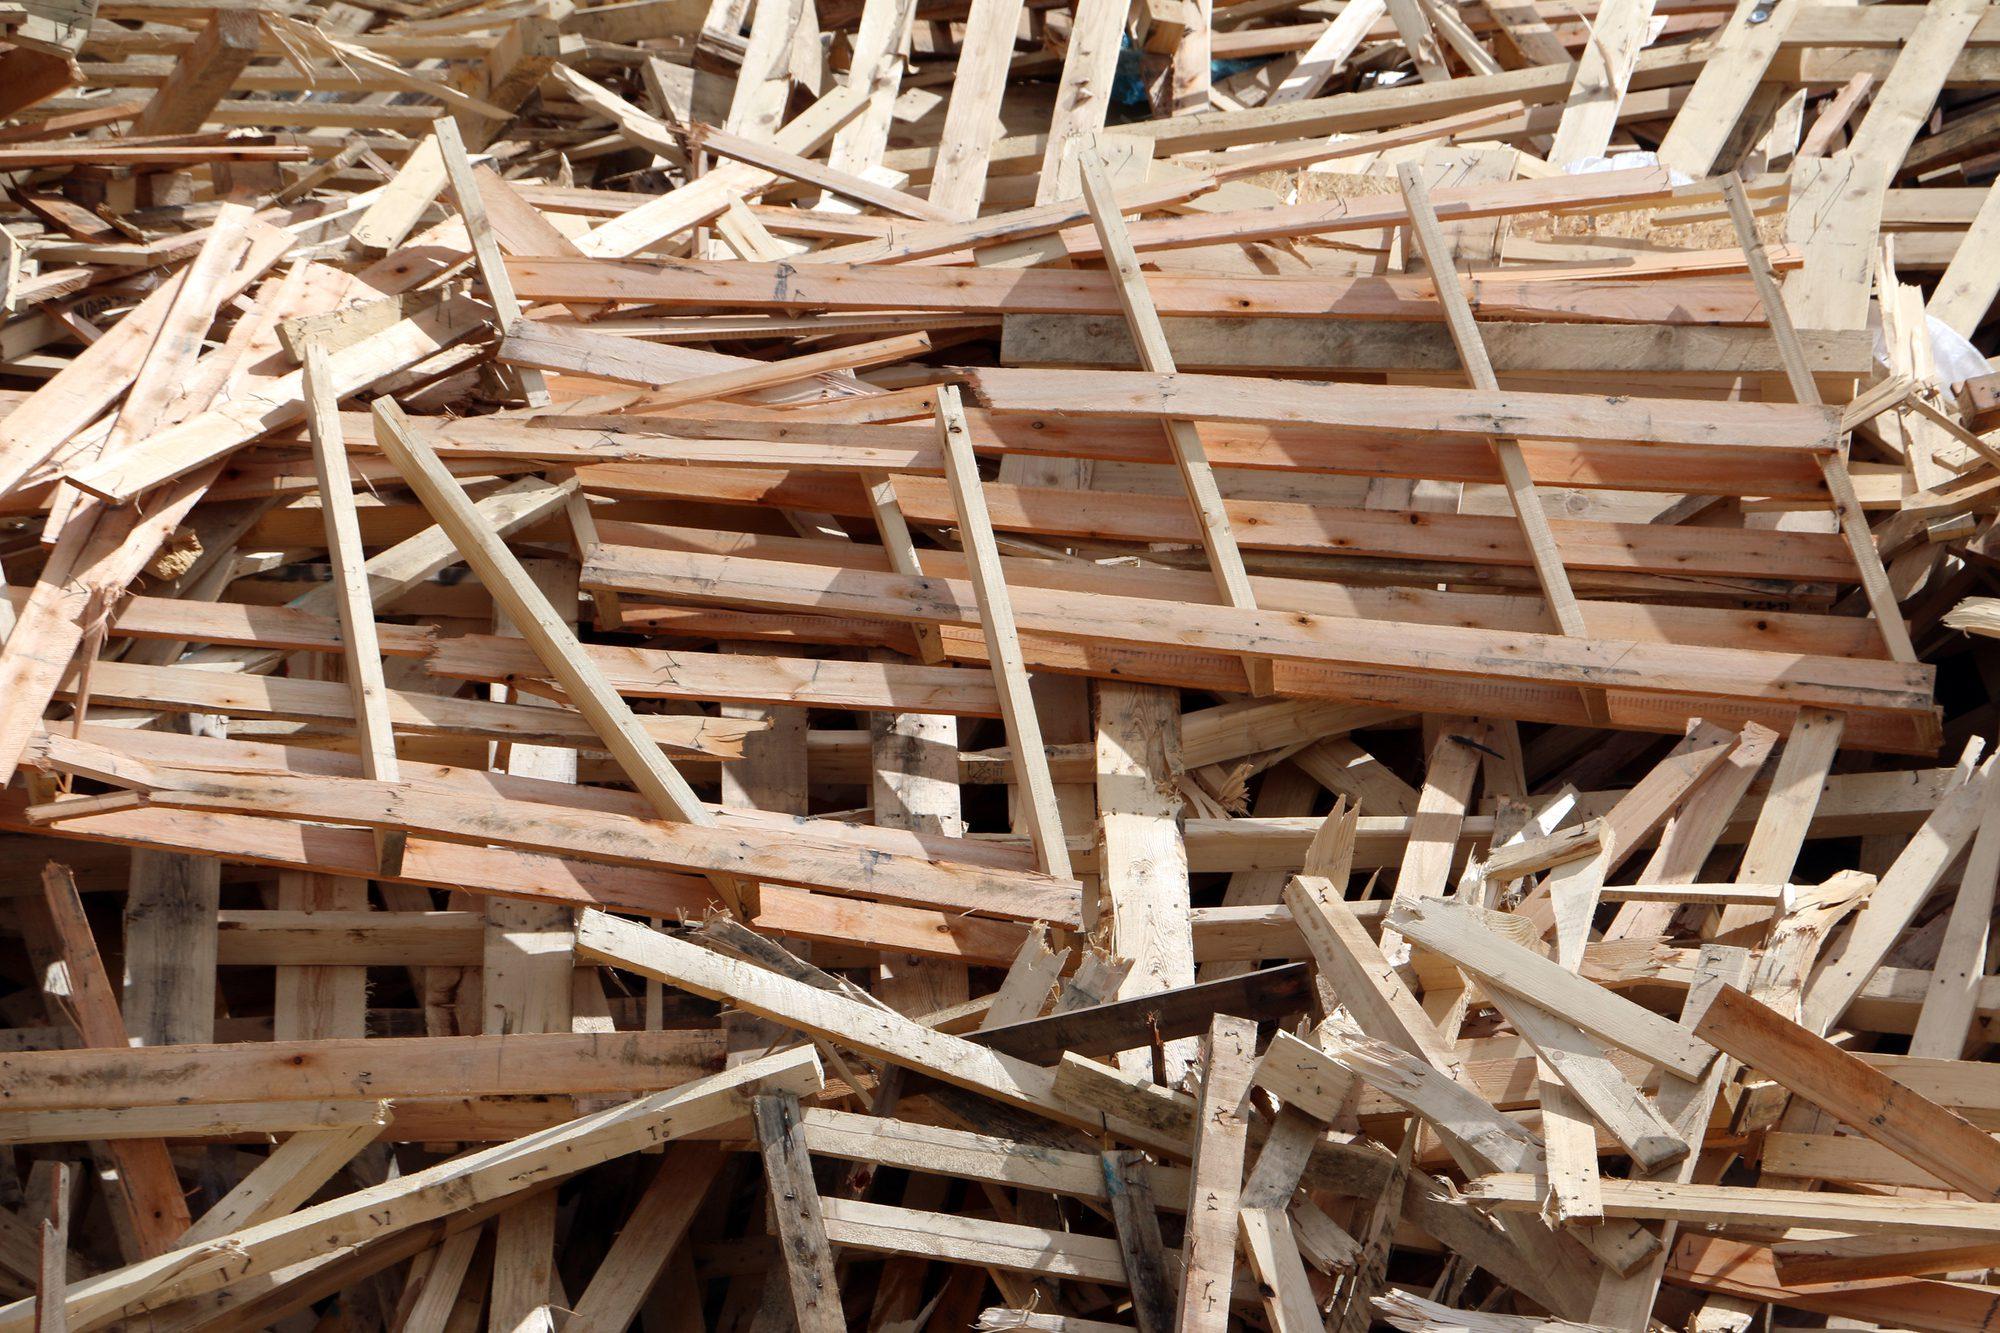 stacked wood pallets, broken